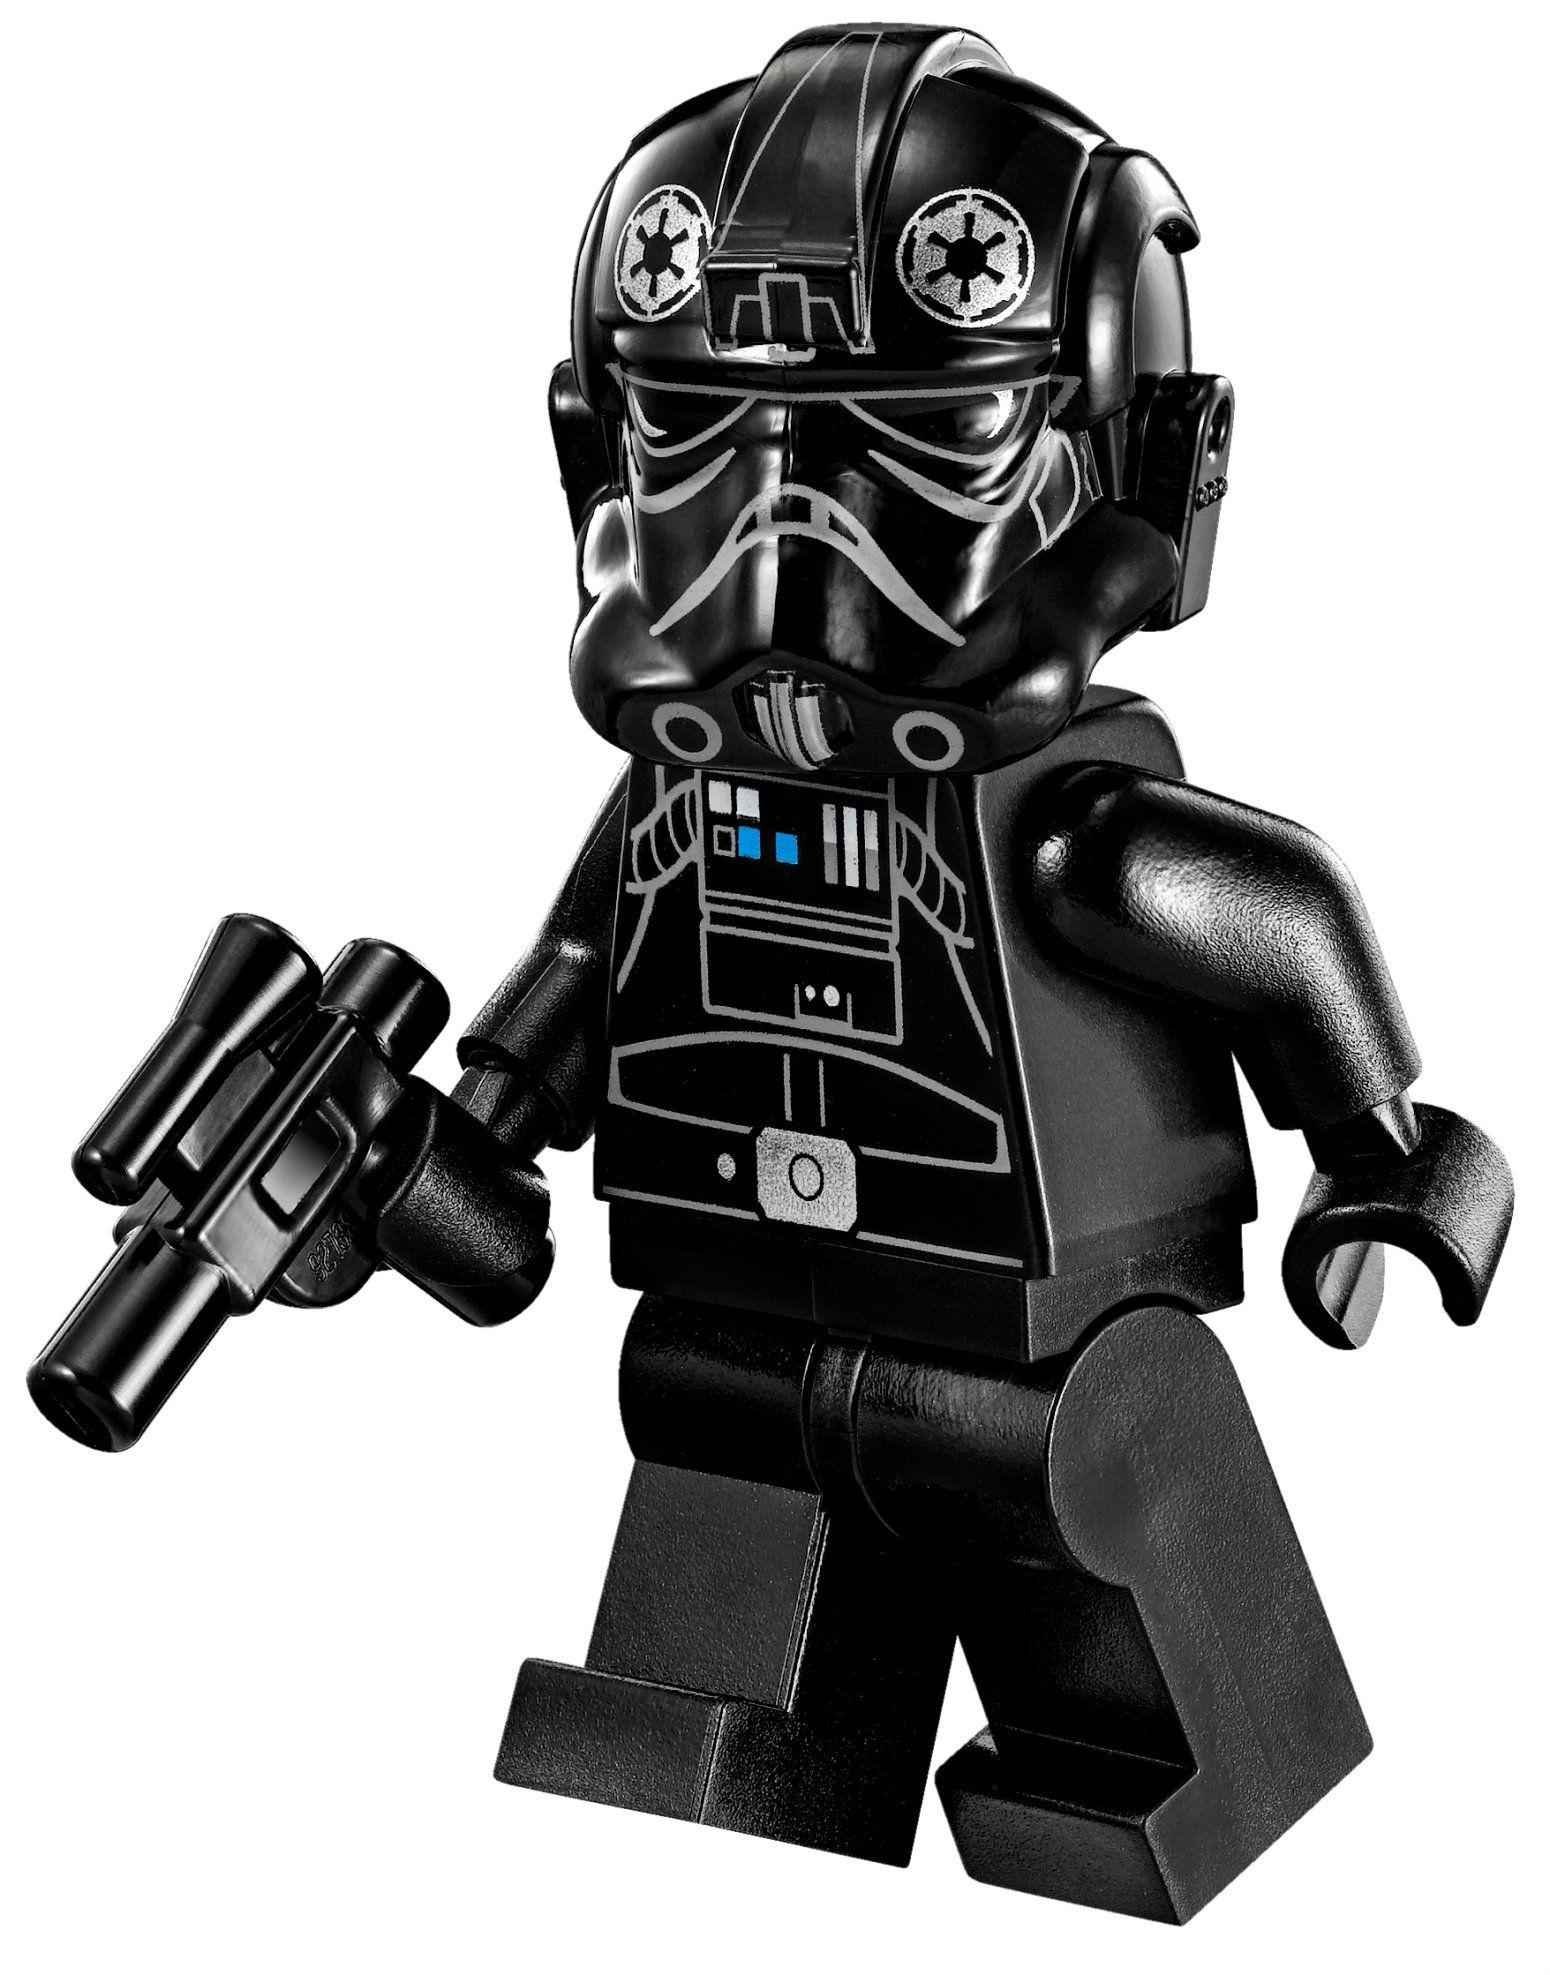 LEGO 75082 STAR WARS Rebels TIE Advanced Prototype Fighter Pilot Minifigure